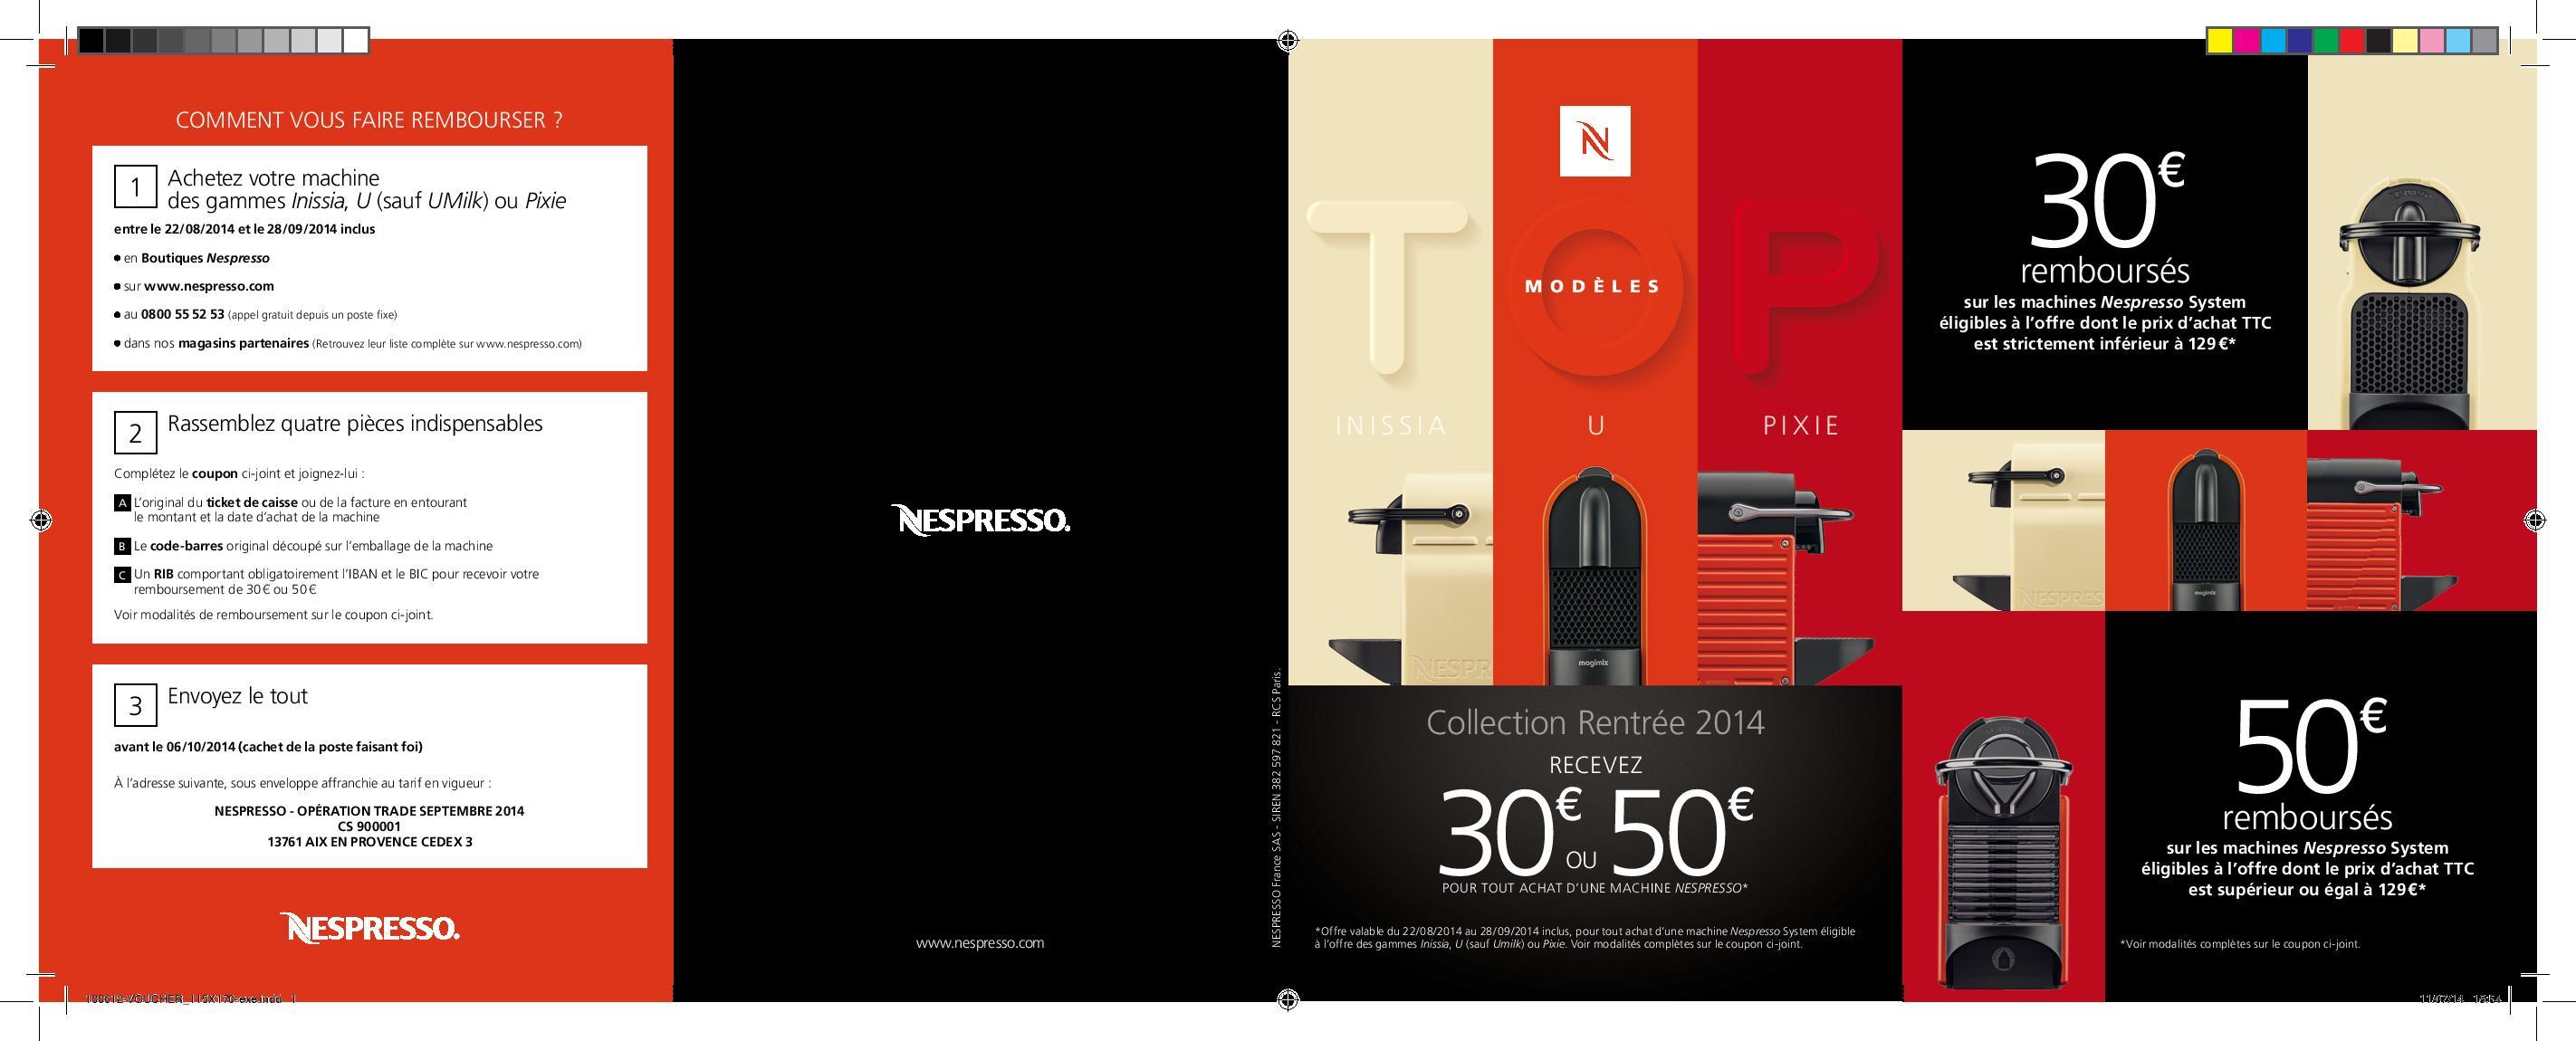 odr offre de remboursement nespresso system-page-001